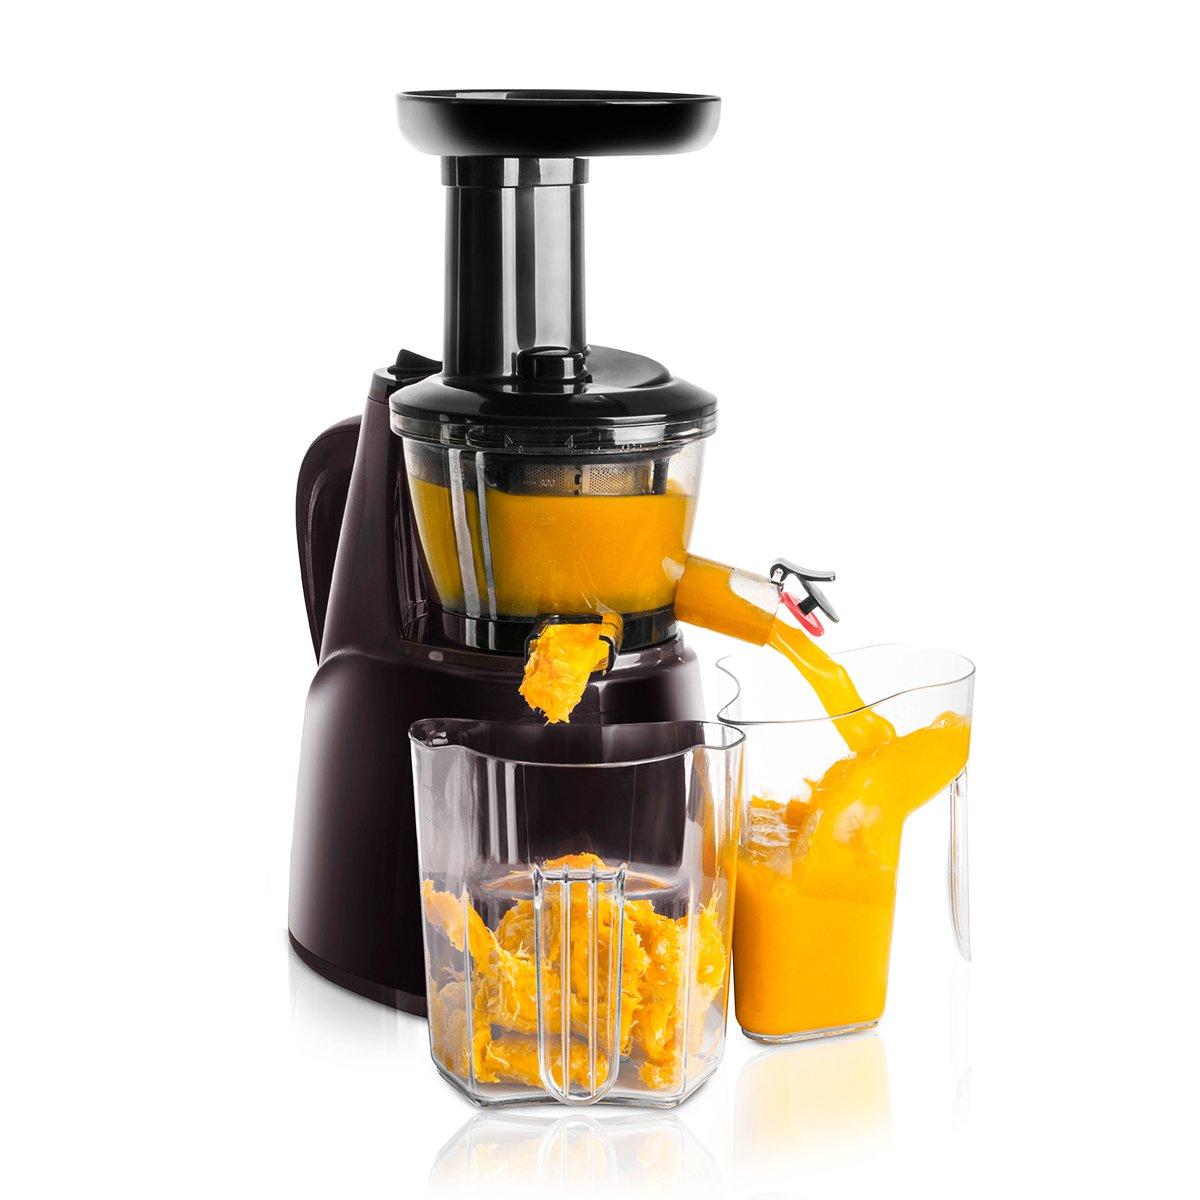 Estrattore di succo Slow Juicer Essence a rotazione lenta 150W Homekraft